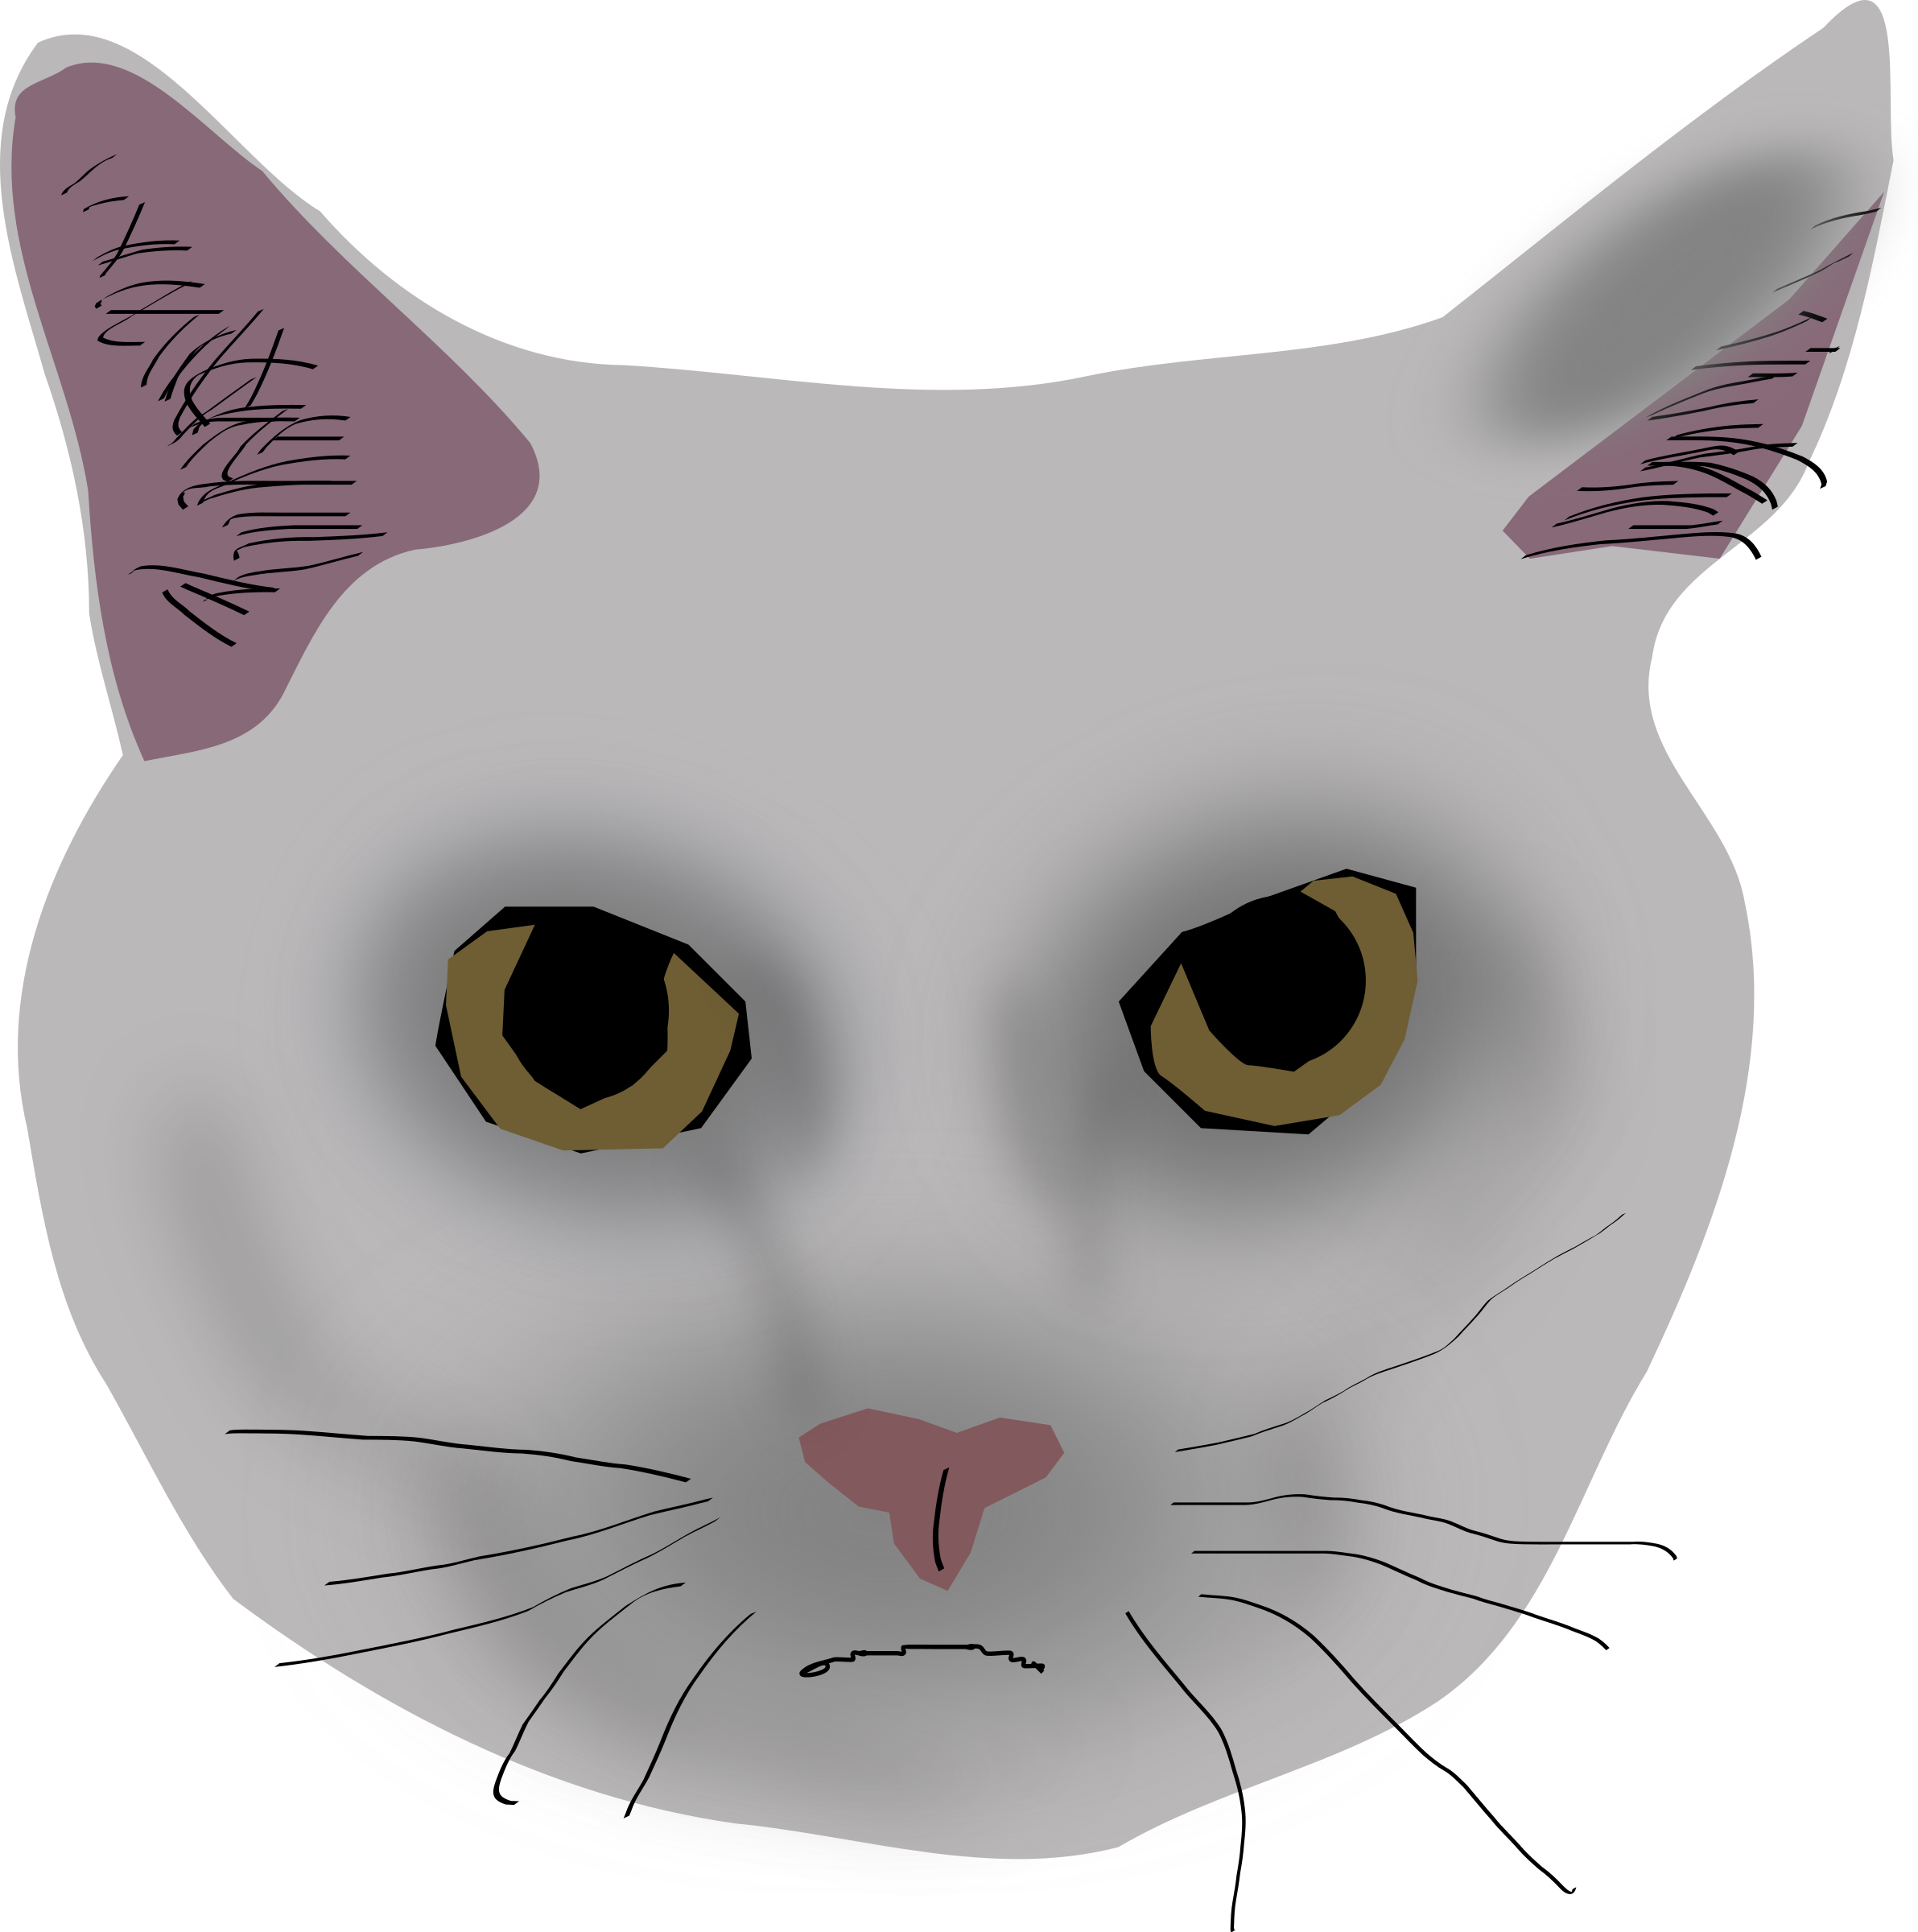 Cat clipart head jpg stock Clipart - Cat head (prototip) jpg stock